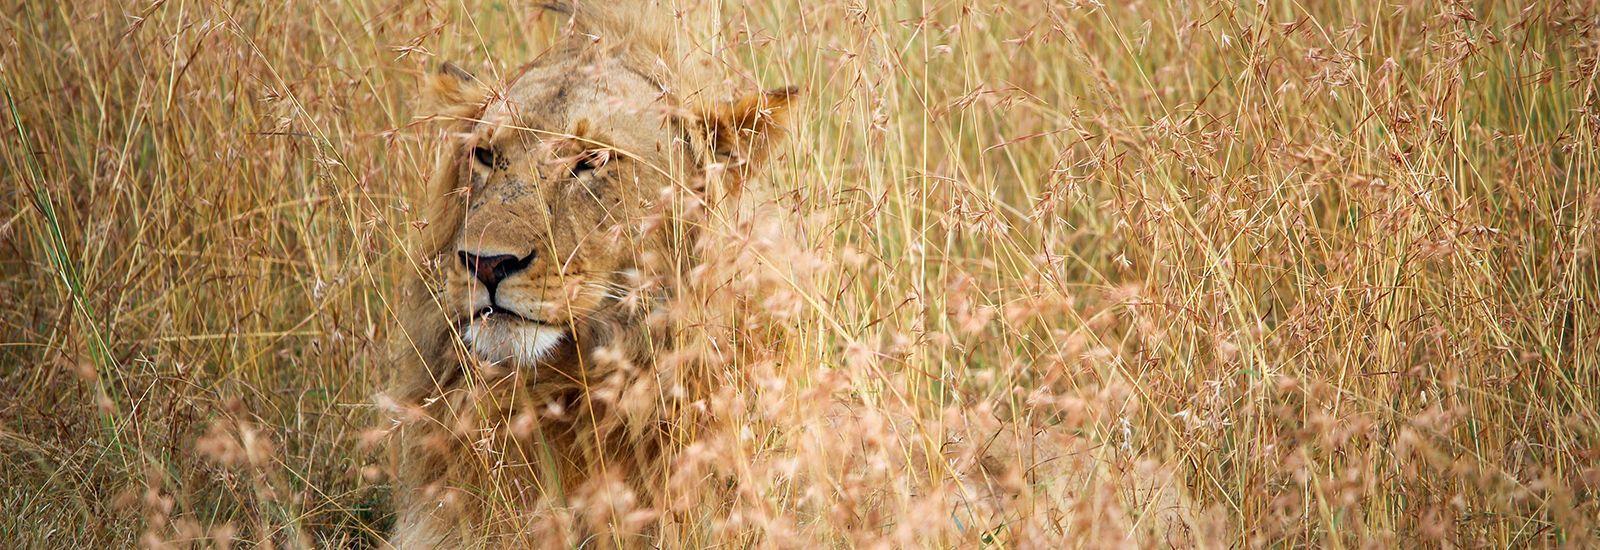 A lion in long grass